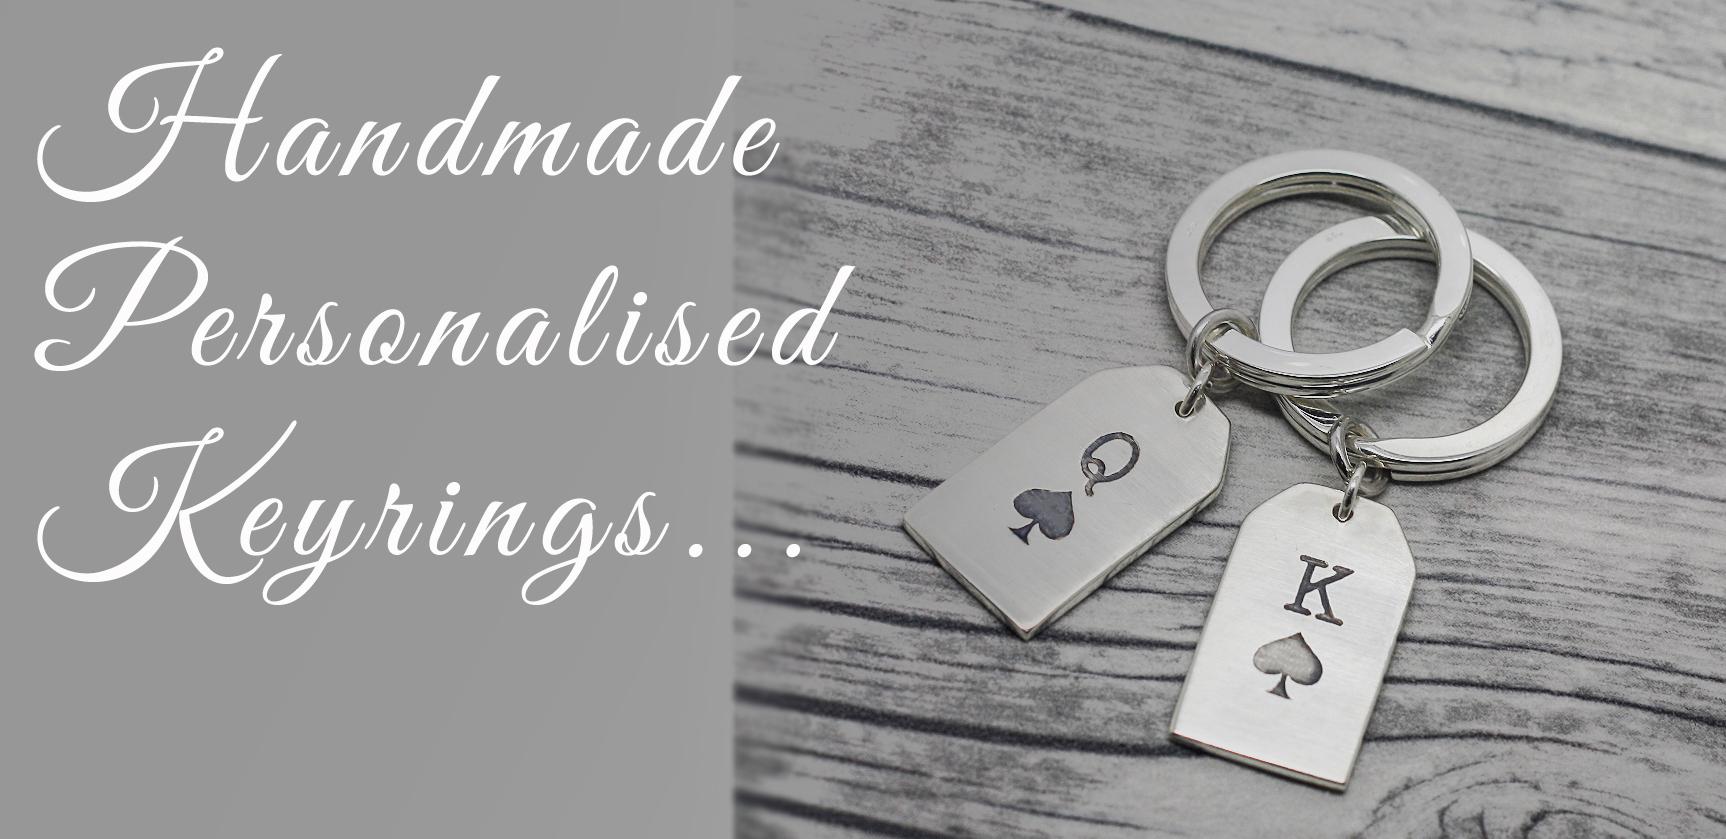 Handmade personalised his & hers sterling silver keyrings uk, wedding day gifts for the bride & groom. by lulu & charles jewellery uk